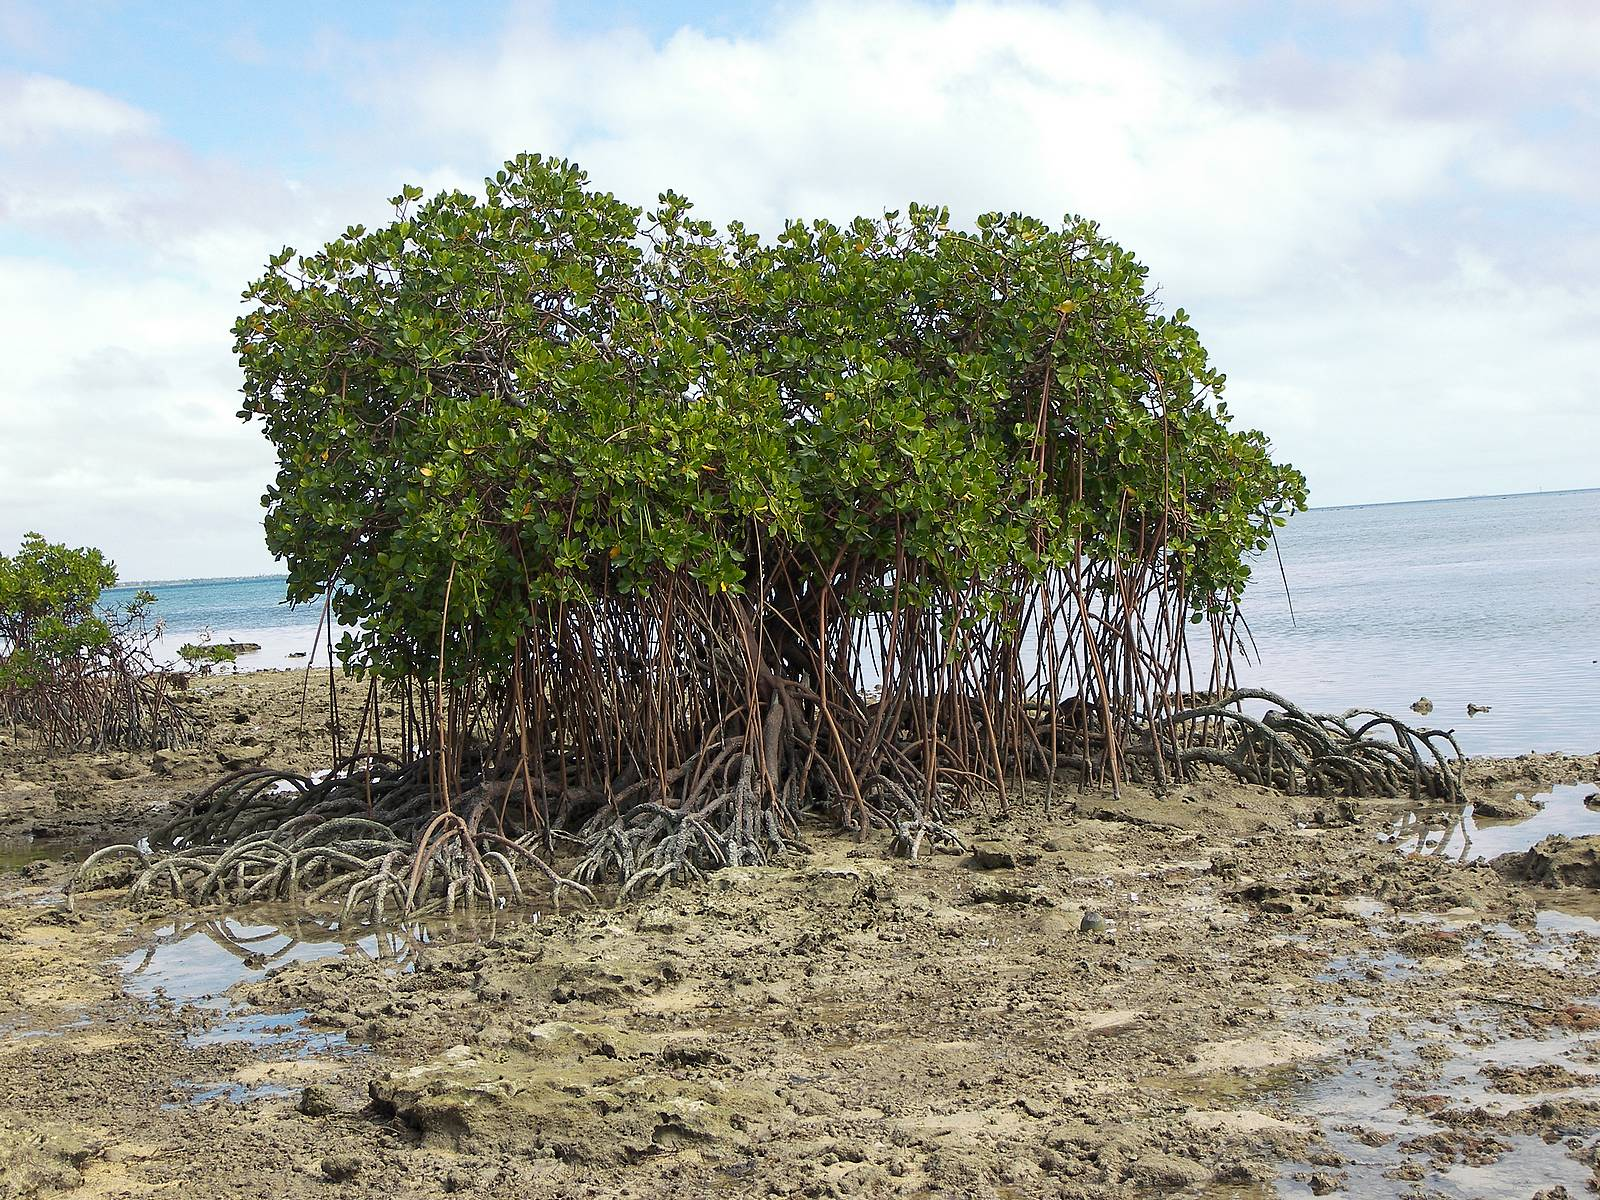 Hd Wallpapers Mangrove Tree Hd Wallpapers